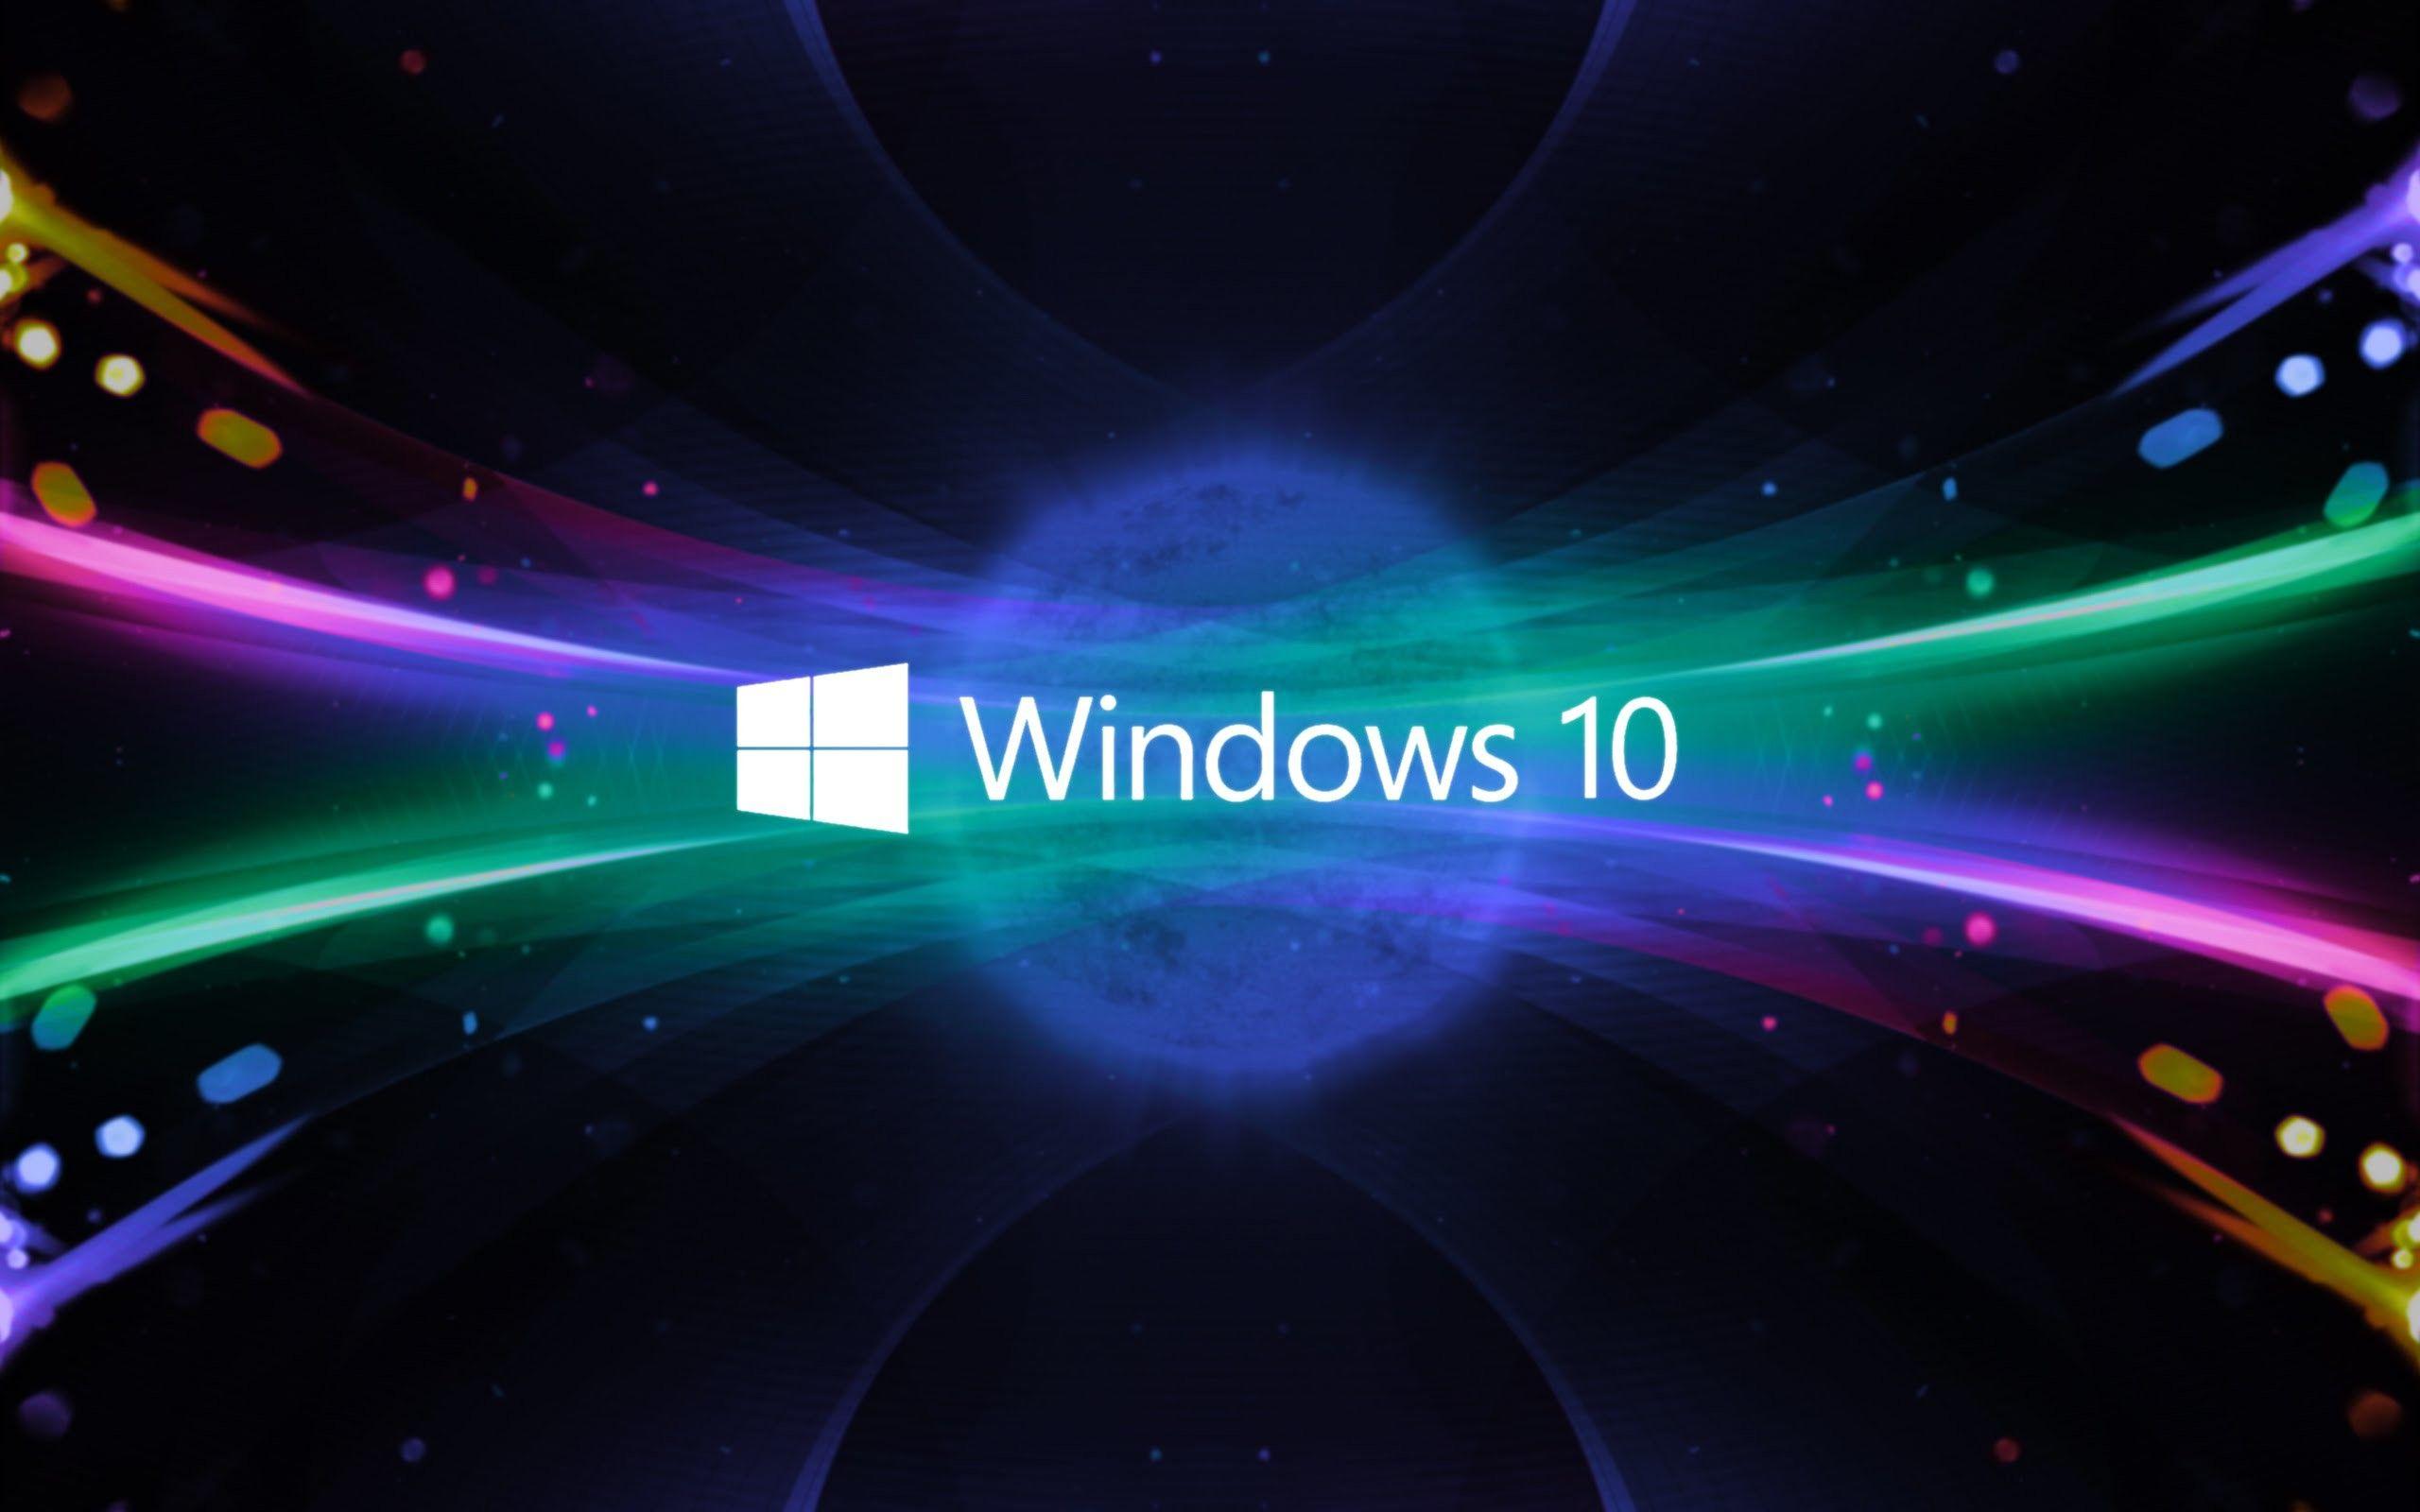 Set Live Wallpaper Windows 10 Free